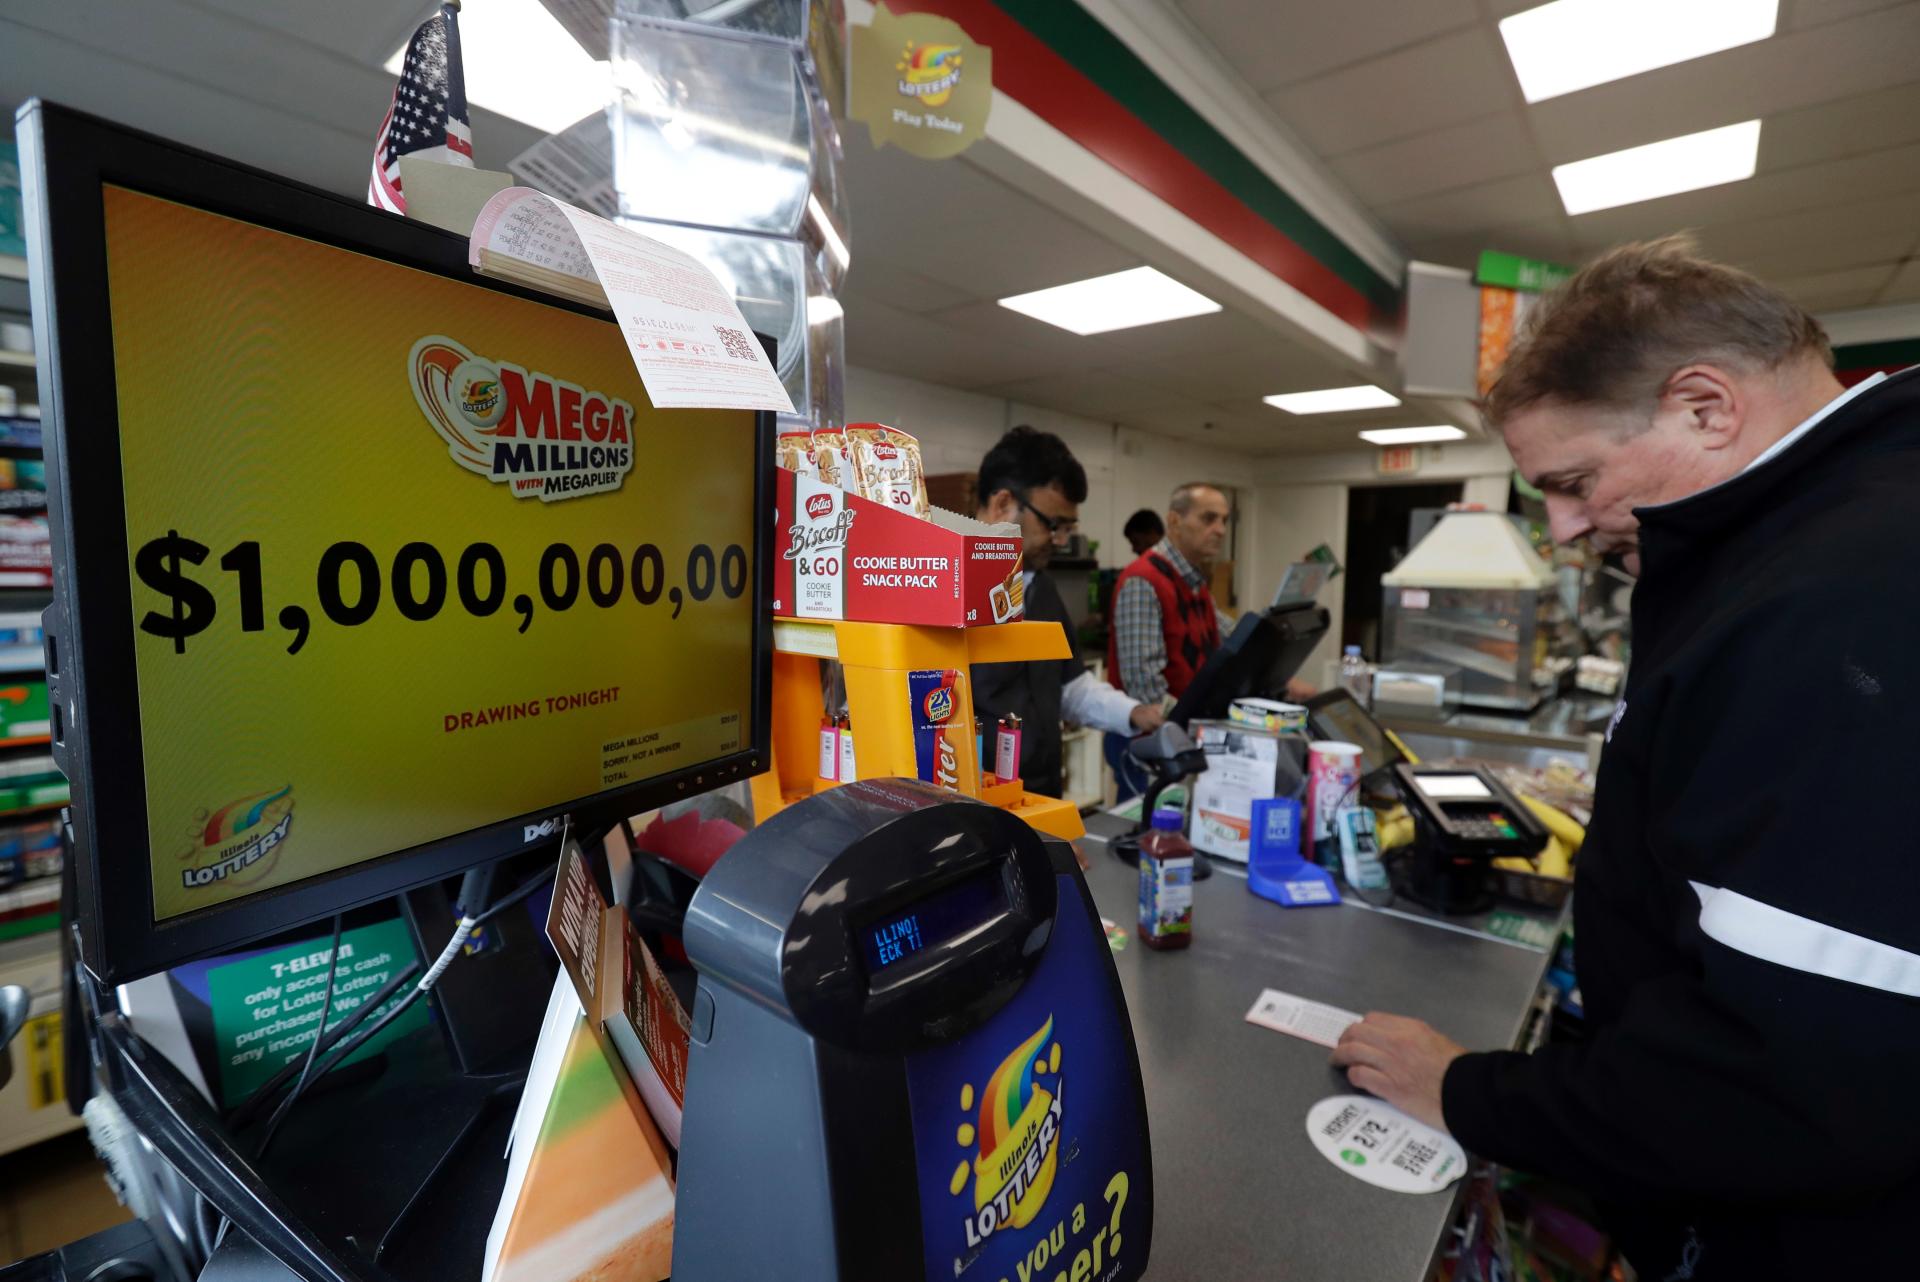 Sales are brisk as Mega Millions jackpot hits $1.6 billion